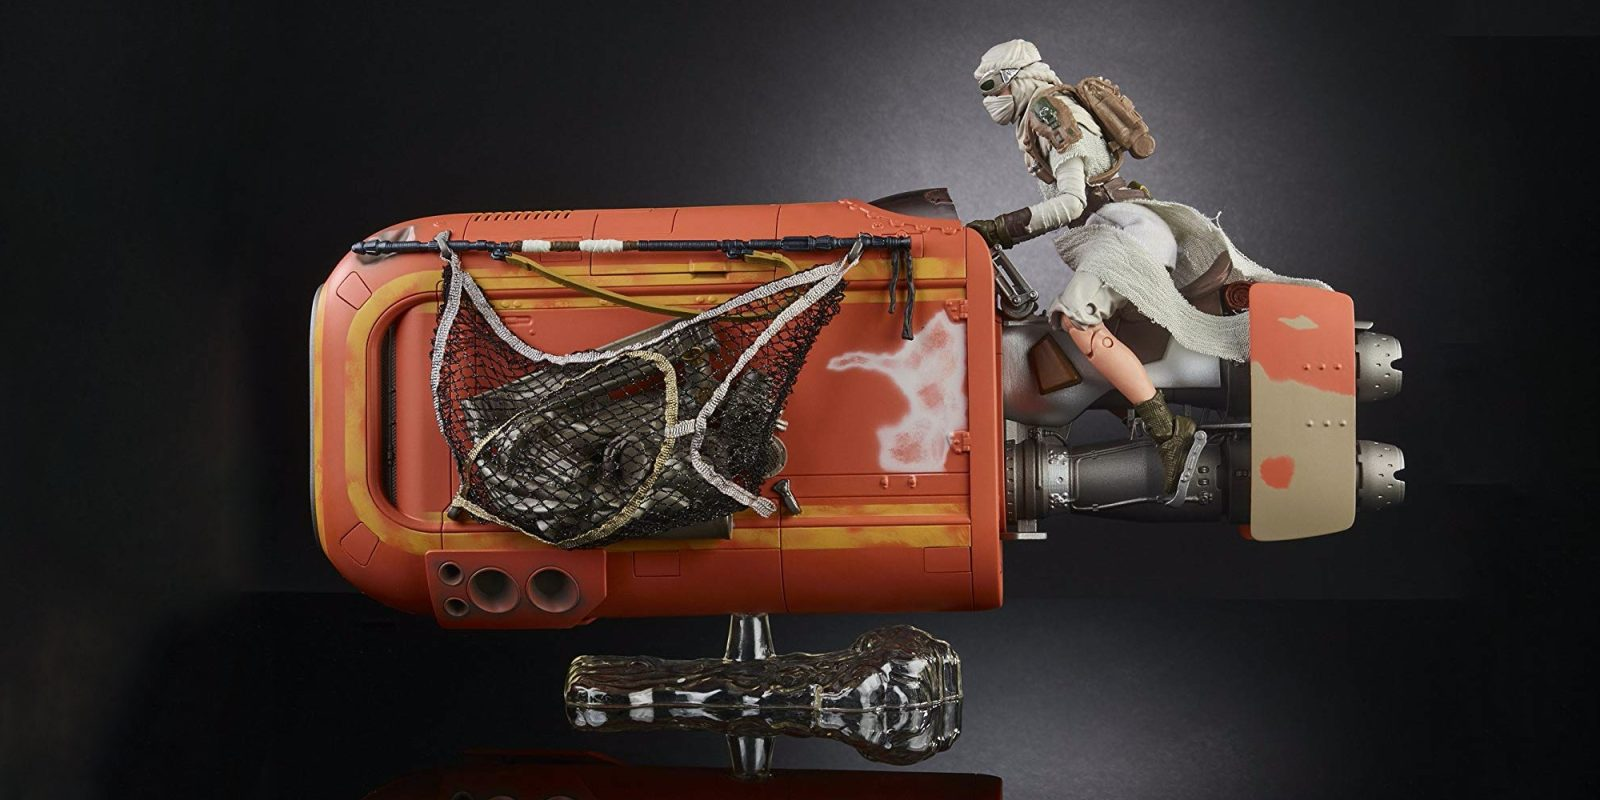 Star Wars fans need Rey's Jakku speeder and figure collectible for $15